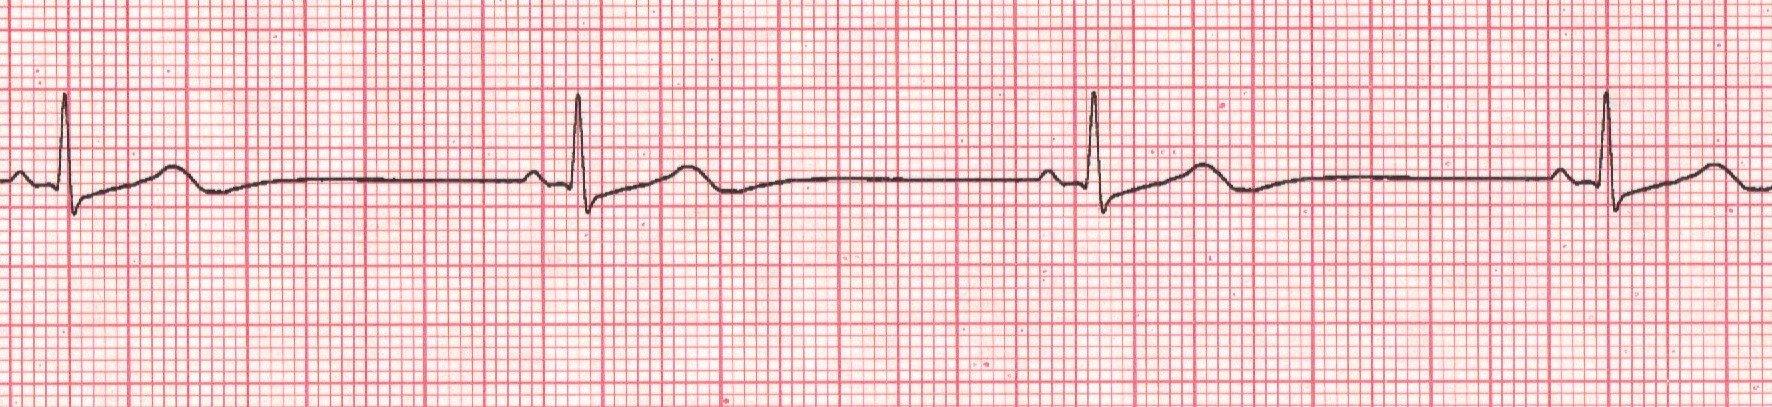 Watch How to Identify Heart Arrhythmias video